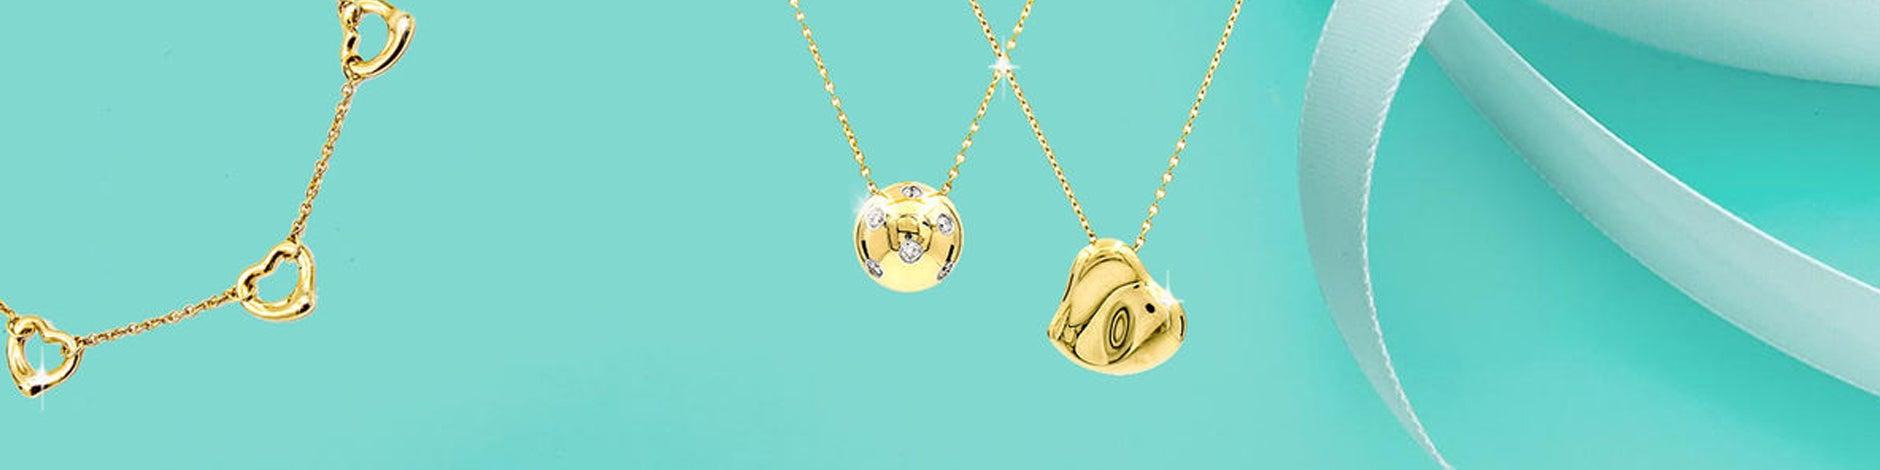 31 Jewels Inc.